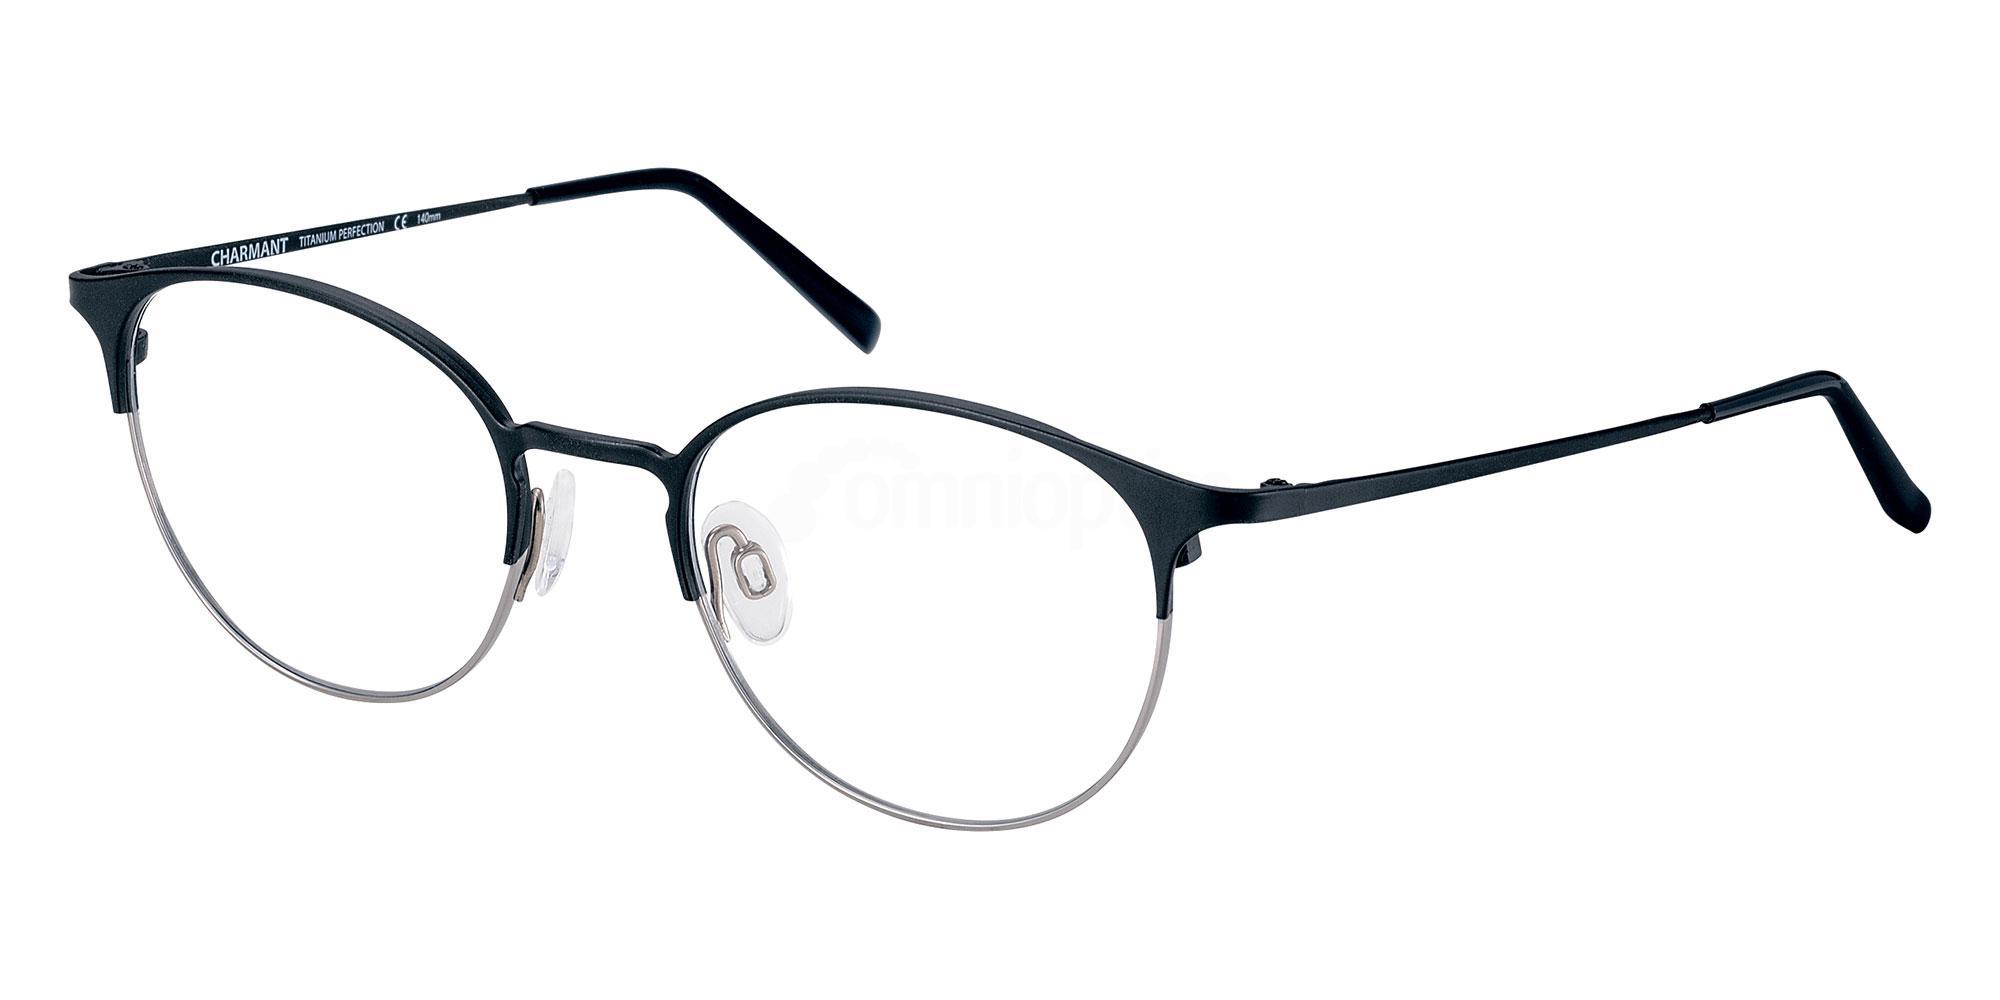 BK CH11465U Glasses, Charmant Titanium Perfection